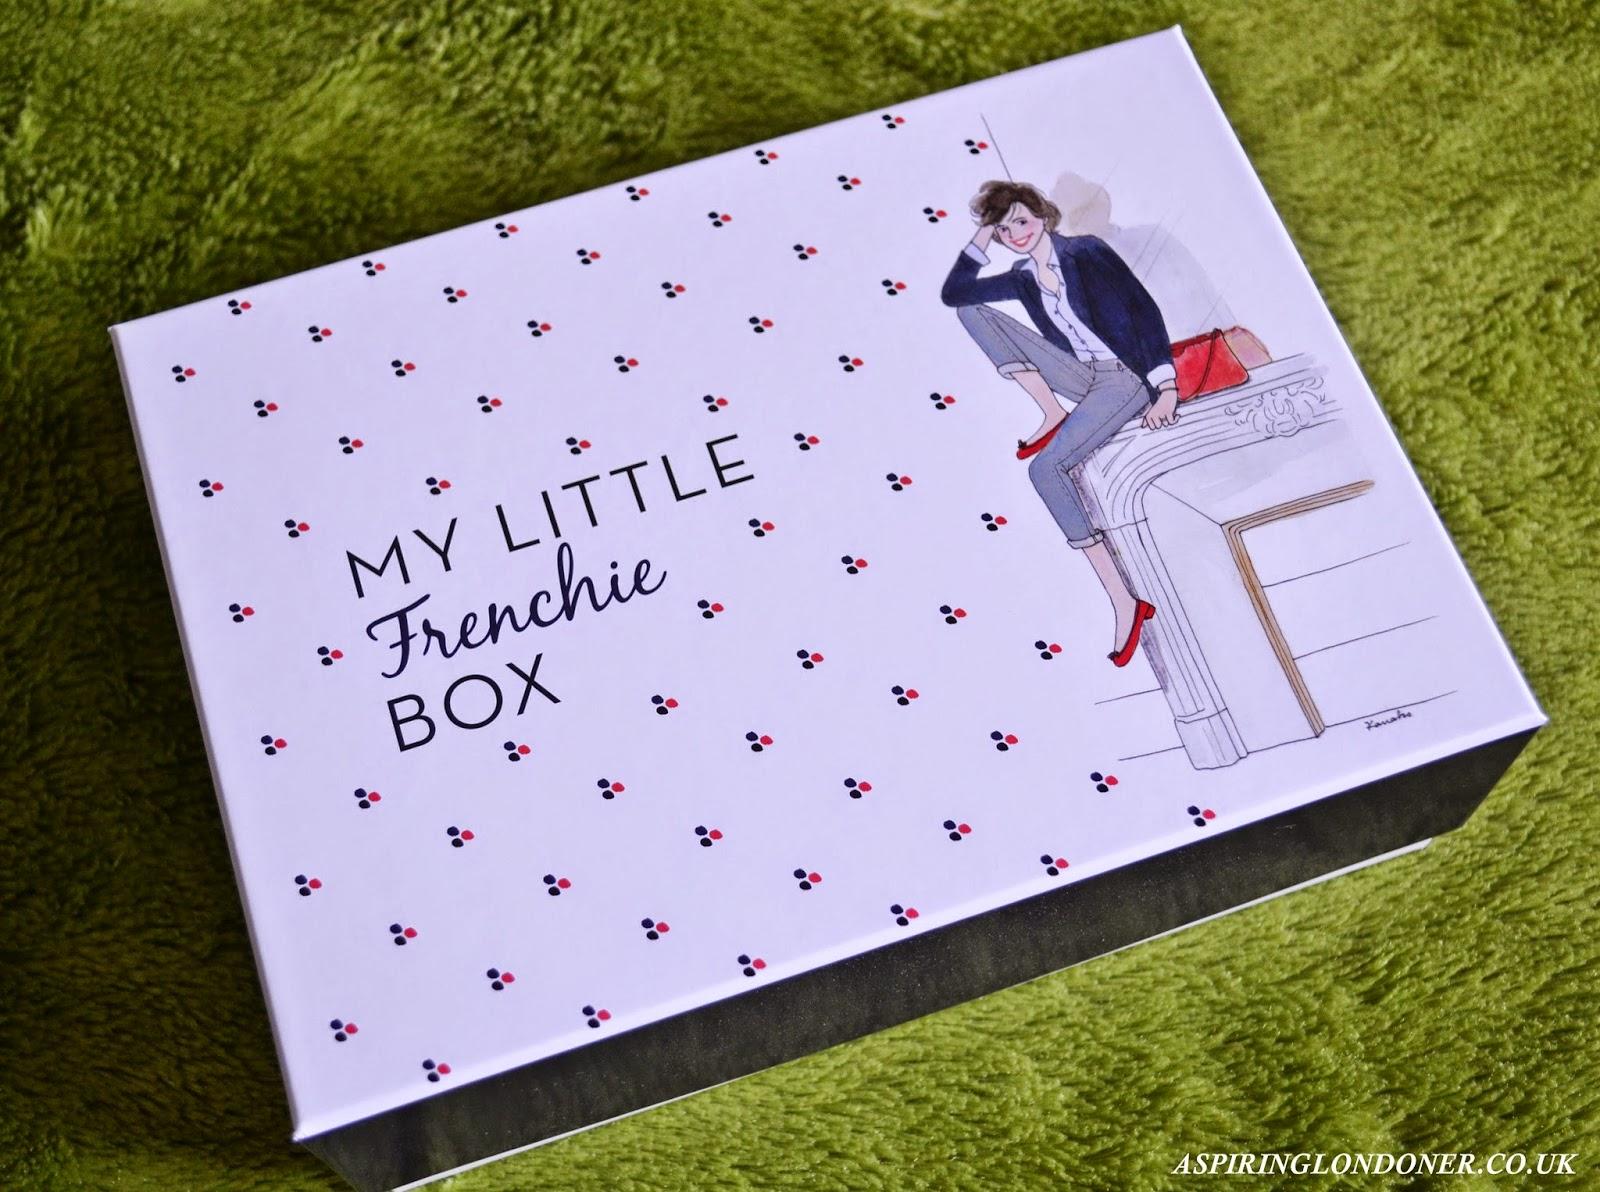 My Little Frenchie Box February 2015 Review - Aspiring Londoner